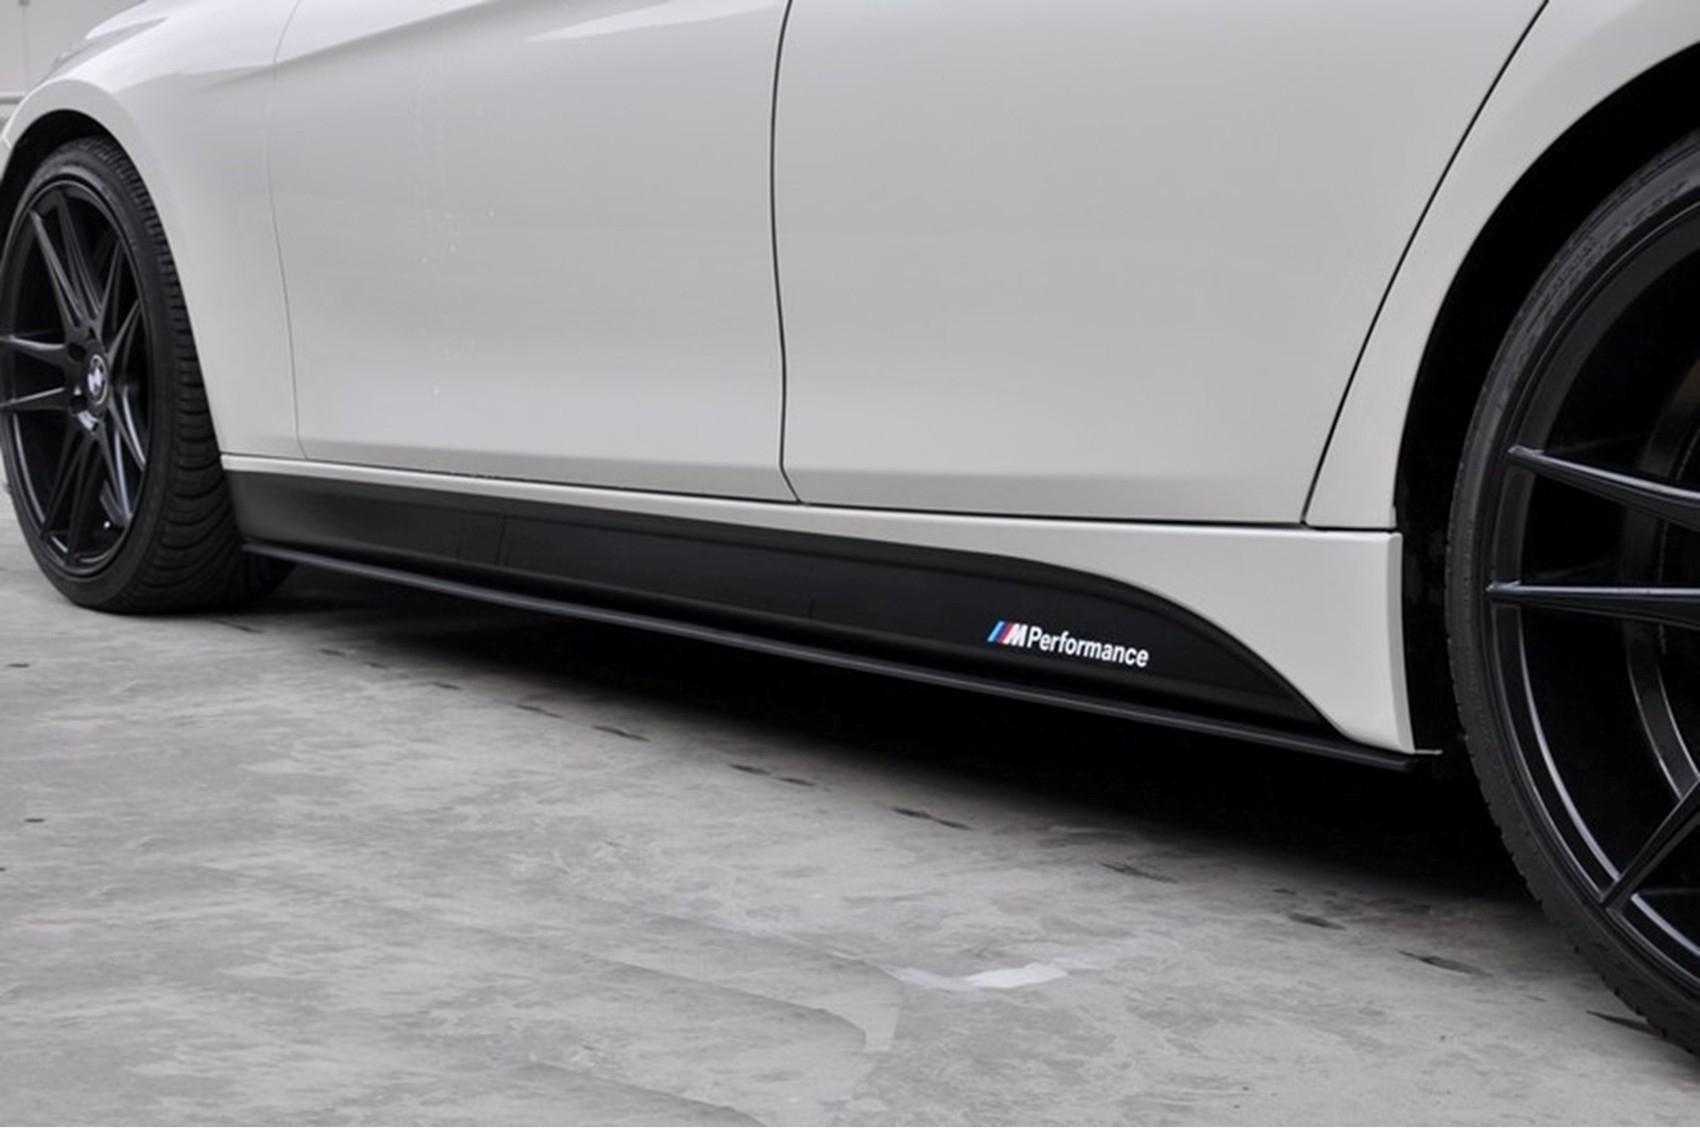 kit carrosserie complet pour bmw f30 2011 m performance. Black Bedroom Furniture Sets. Home Design Ideas